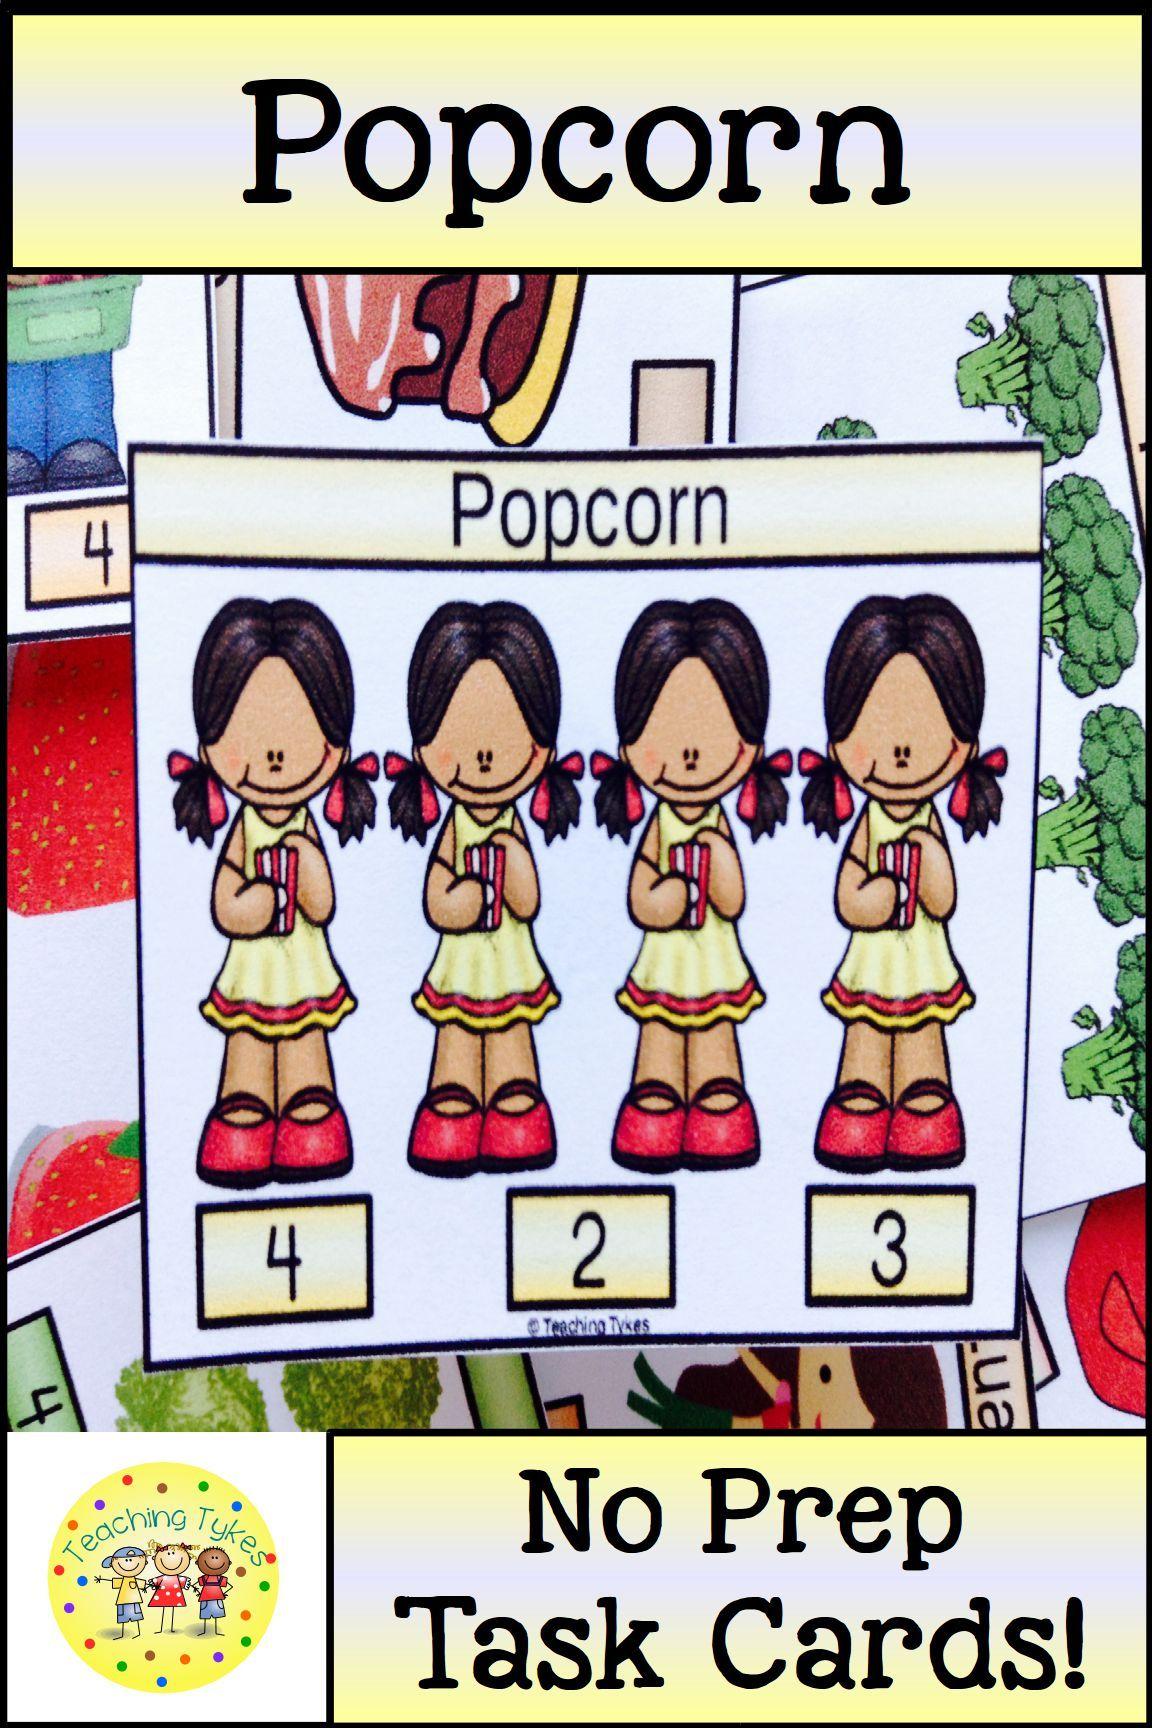 Popcorn Activity To Practice Counting Popcorn